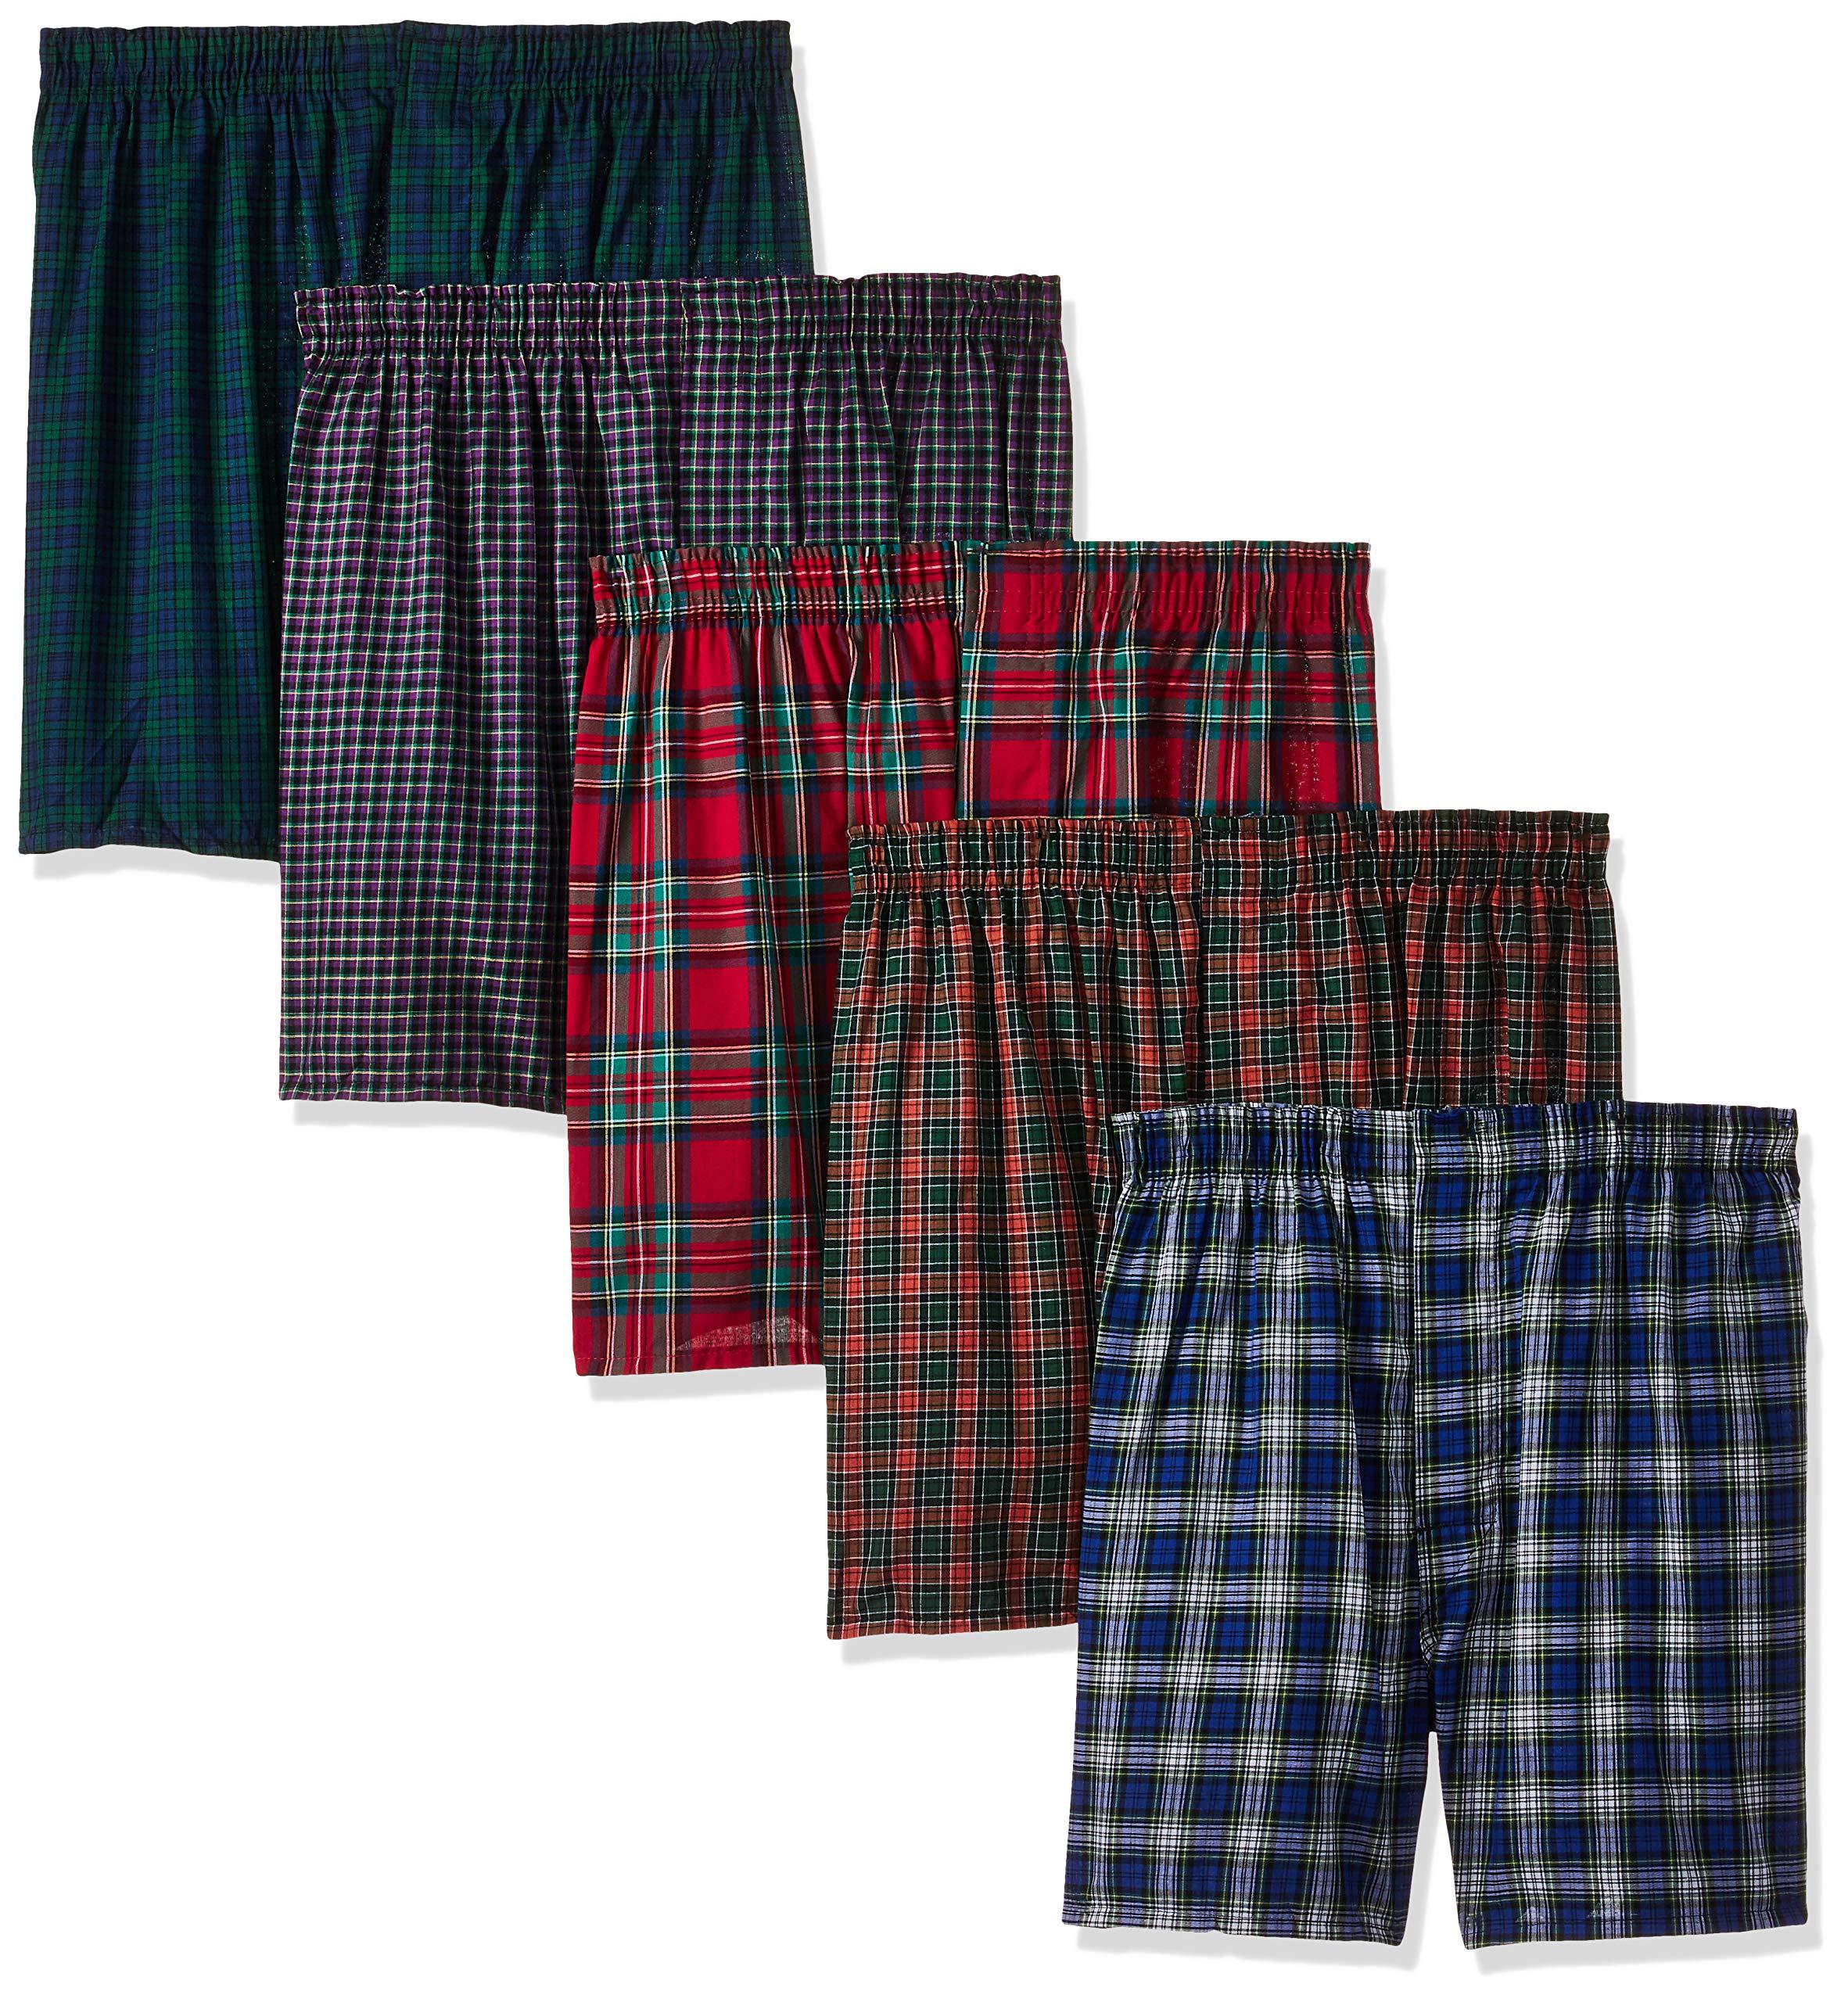 Hanes Ultimate Men's Tartan Premium 5-Pack Cotton Plush Waistband Boxers